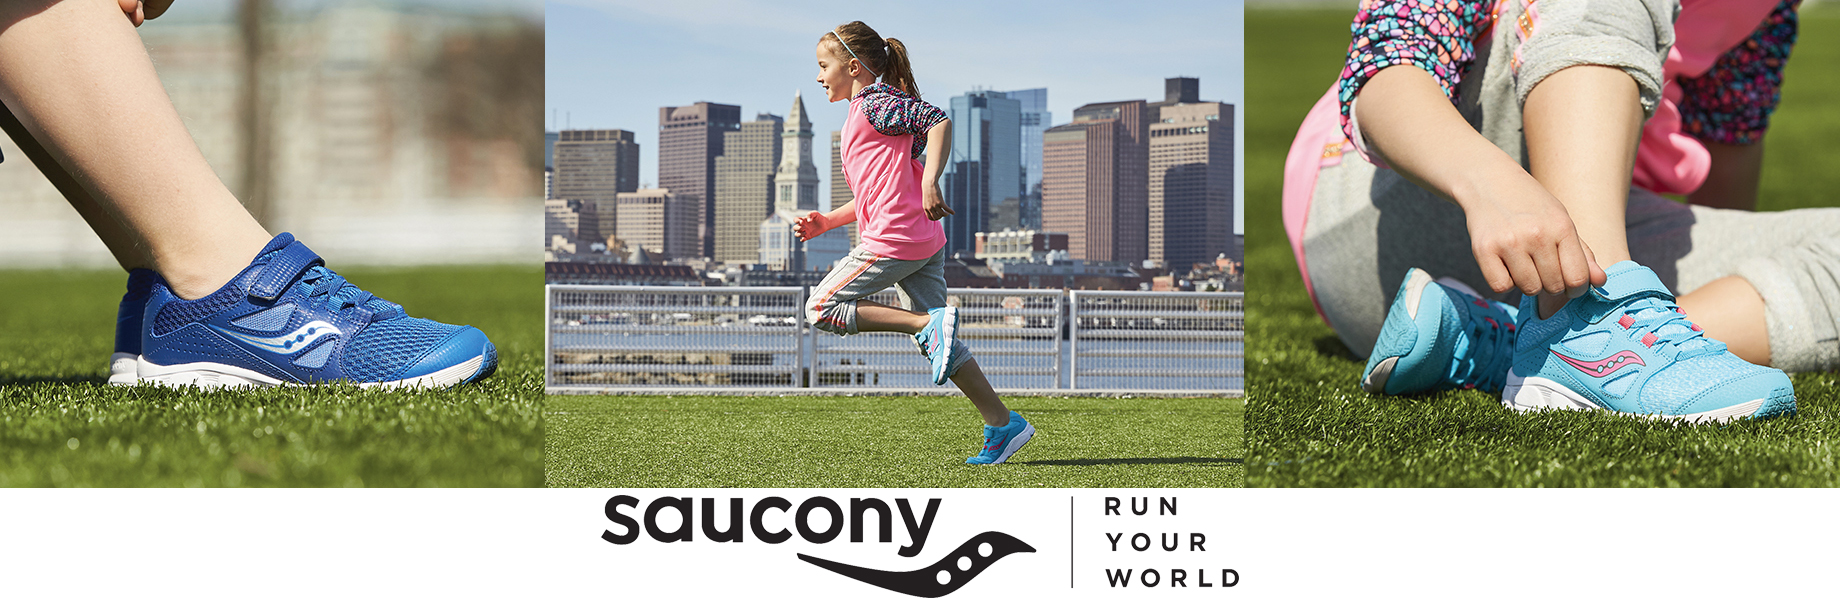 saucony-brand-banner.jpg